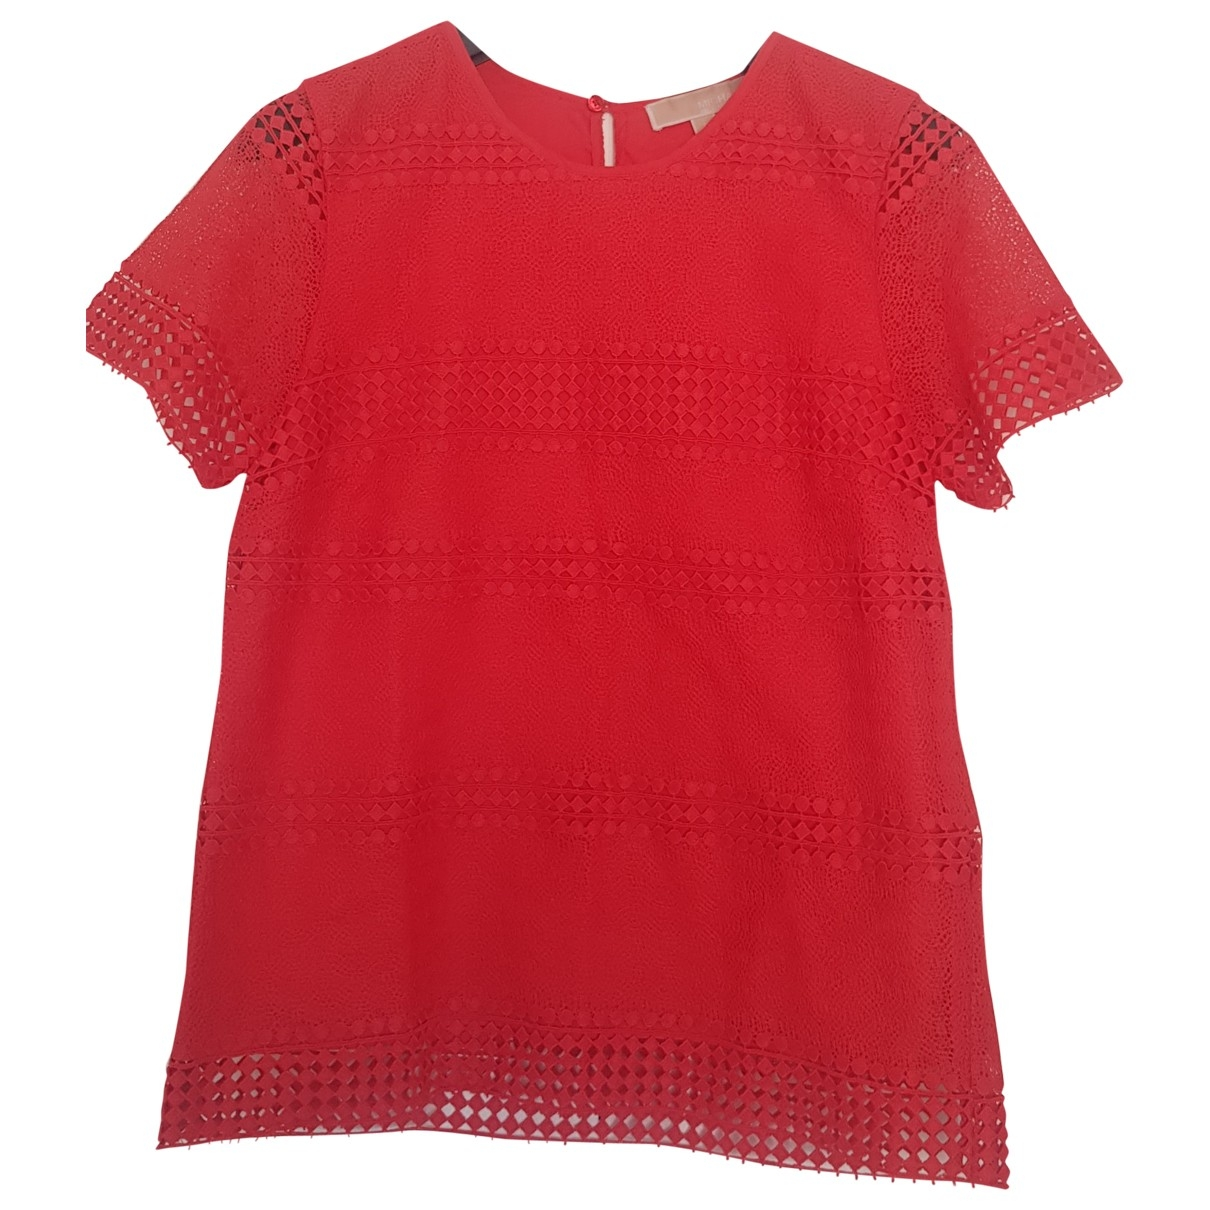 Camiseta Michael Kors